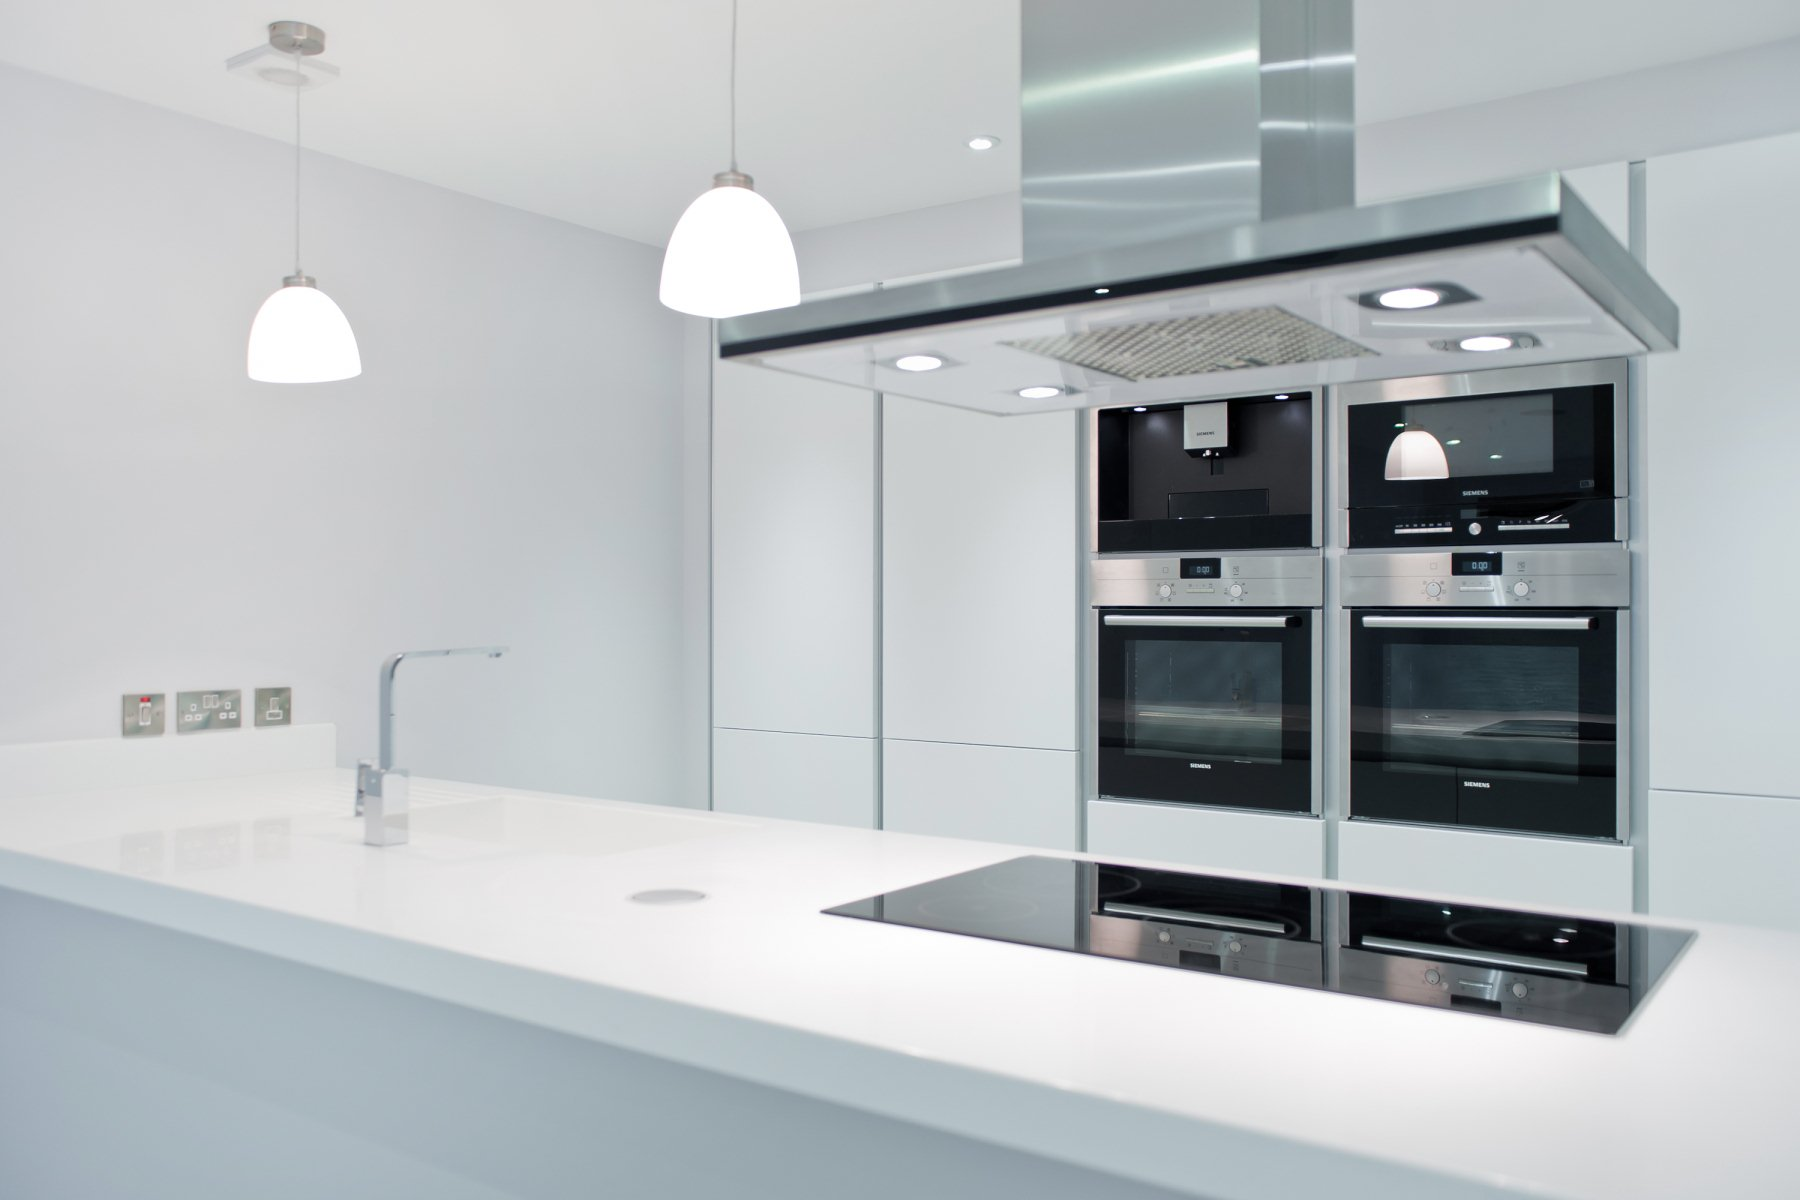 JSPL - 2 Chapter House, SW1P - Kitchen.jpg